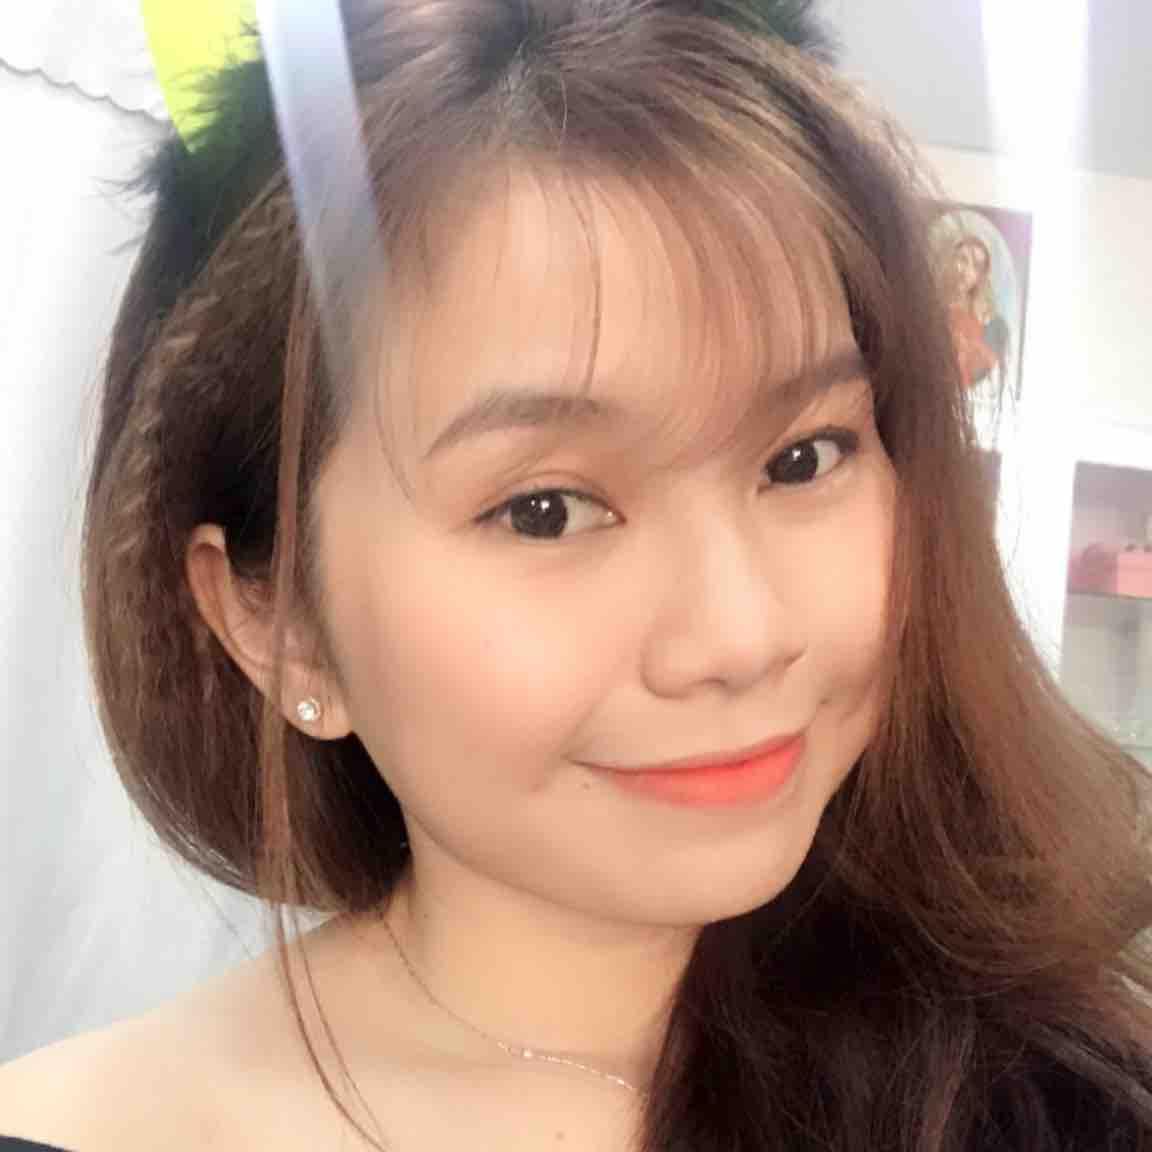 [Karaoke] Bún Riêu Cua Đồng - Beat Nữ, www.kyniemtl.com